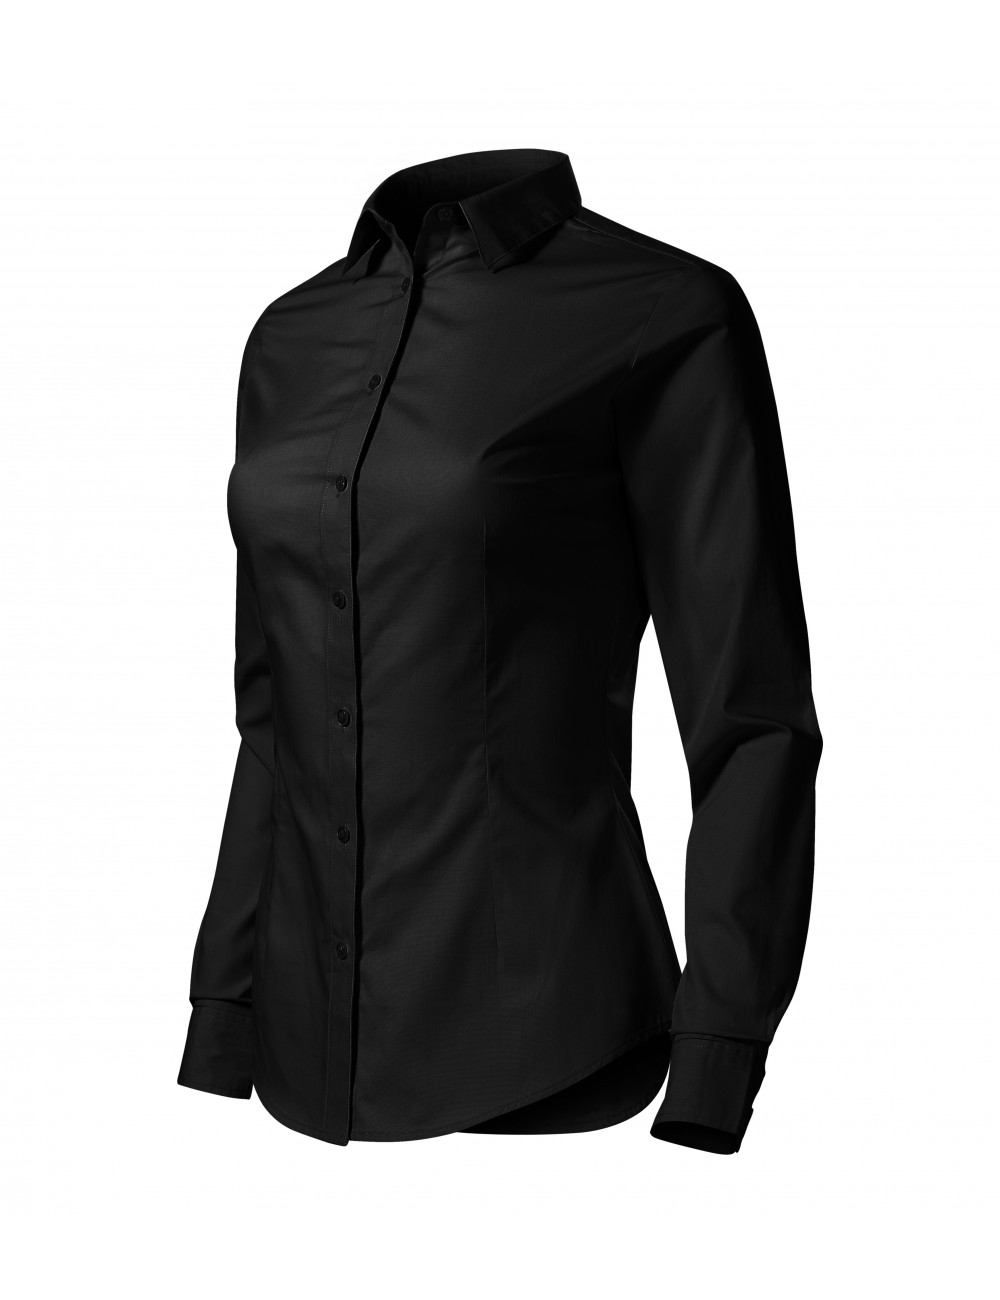 Adler MALFINI Koszula damska Style LS 229 czarny